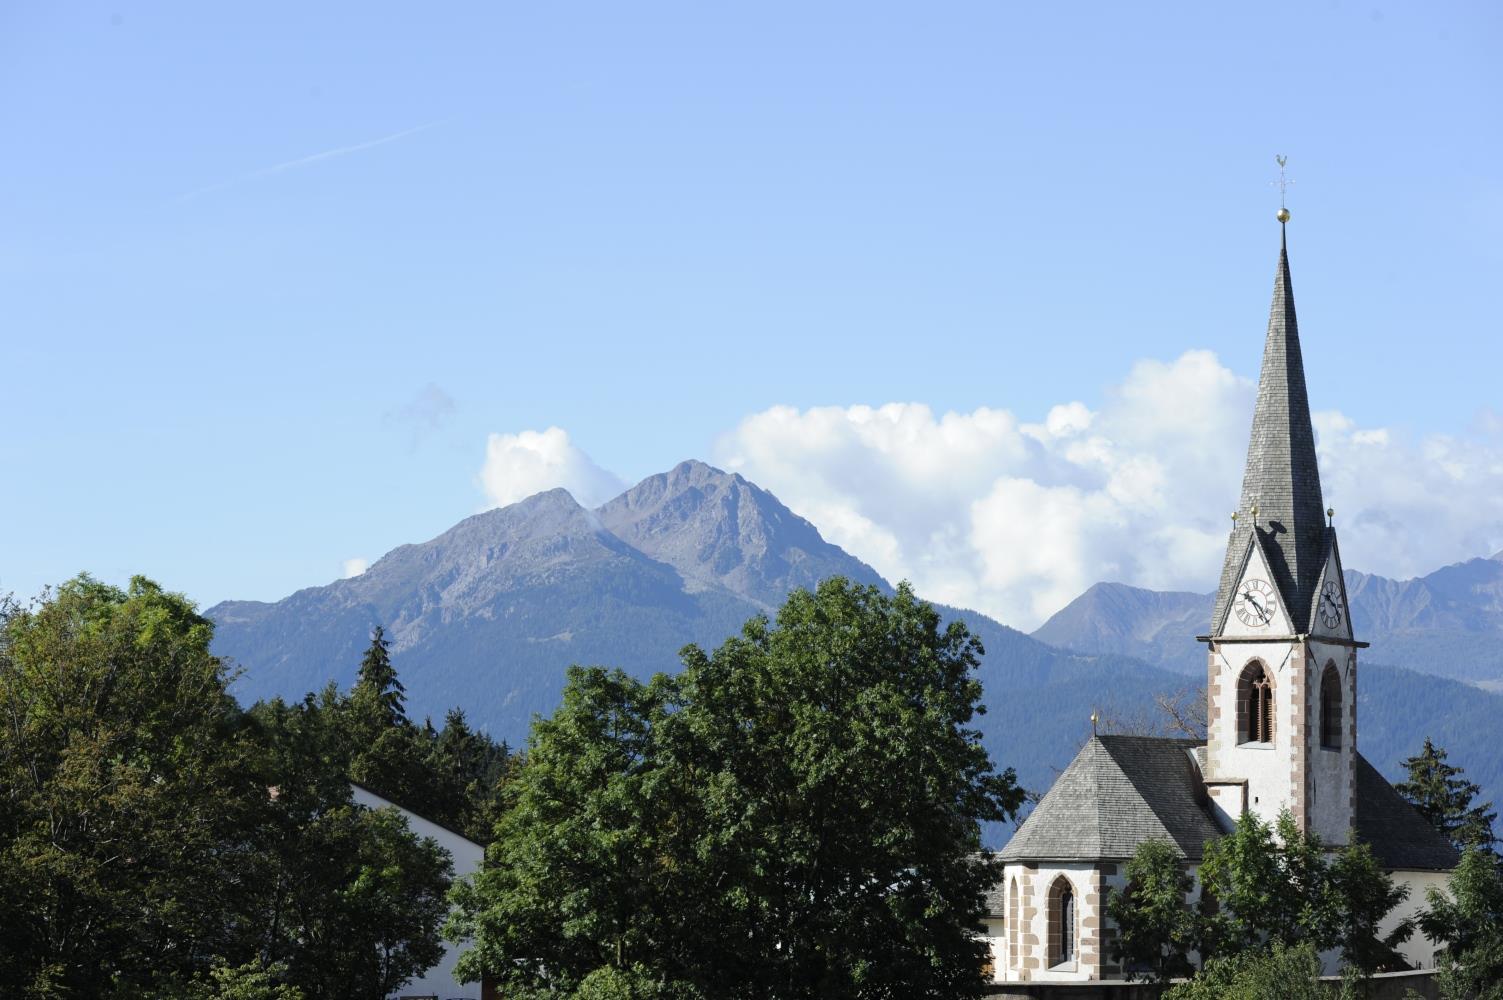 Pfarrkirche zum Hl. Johann